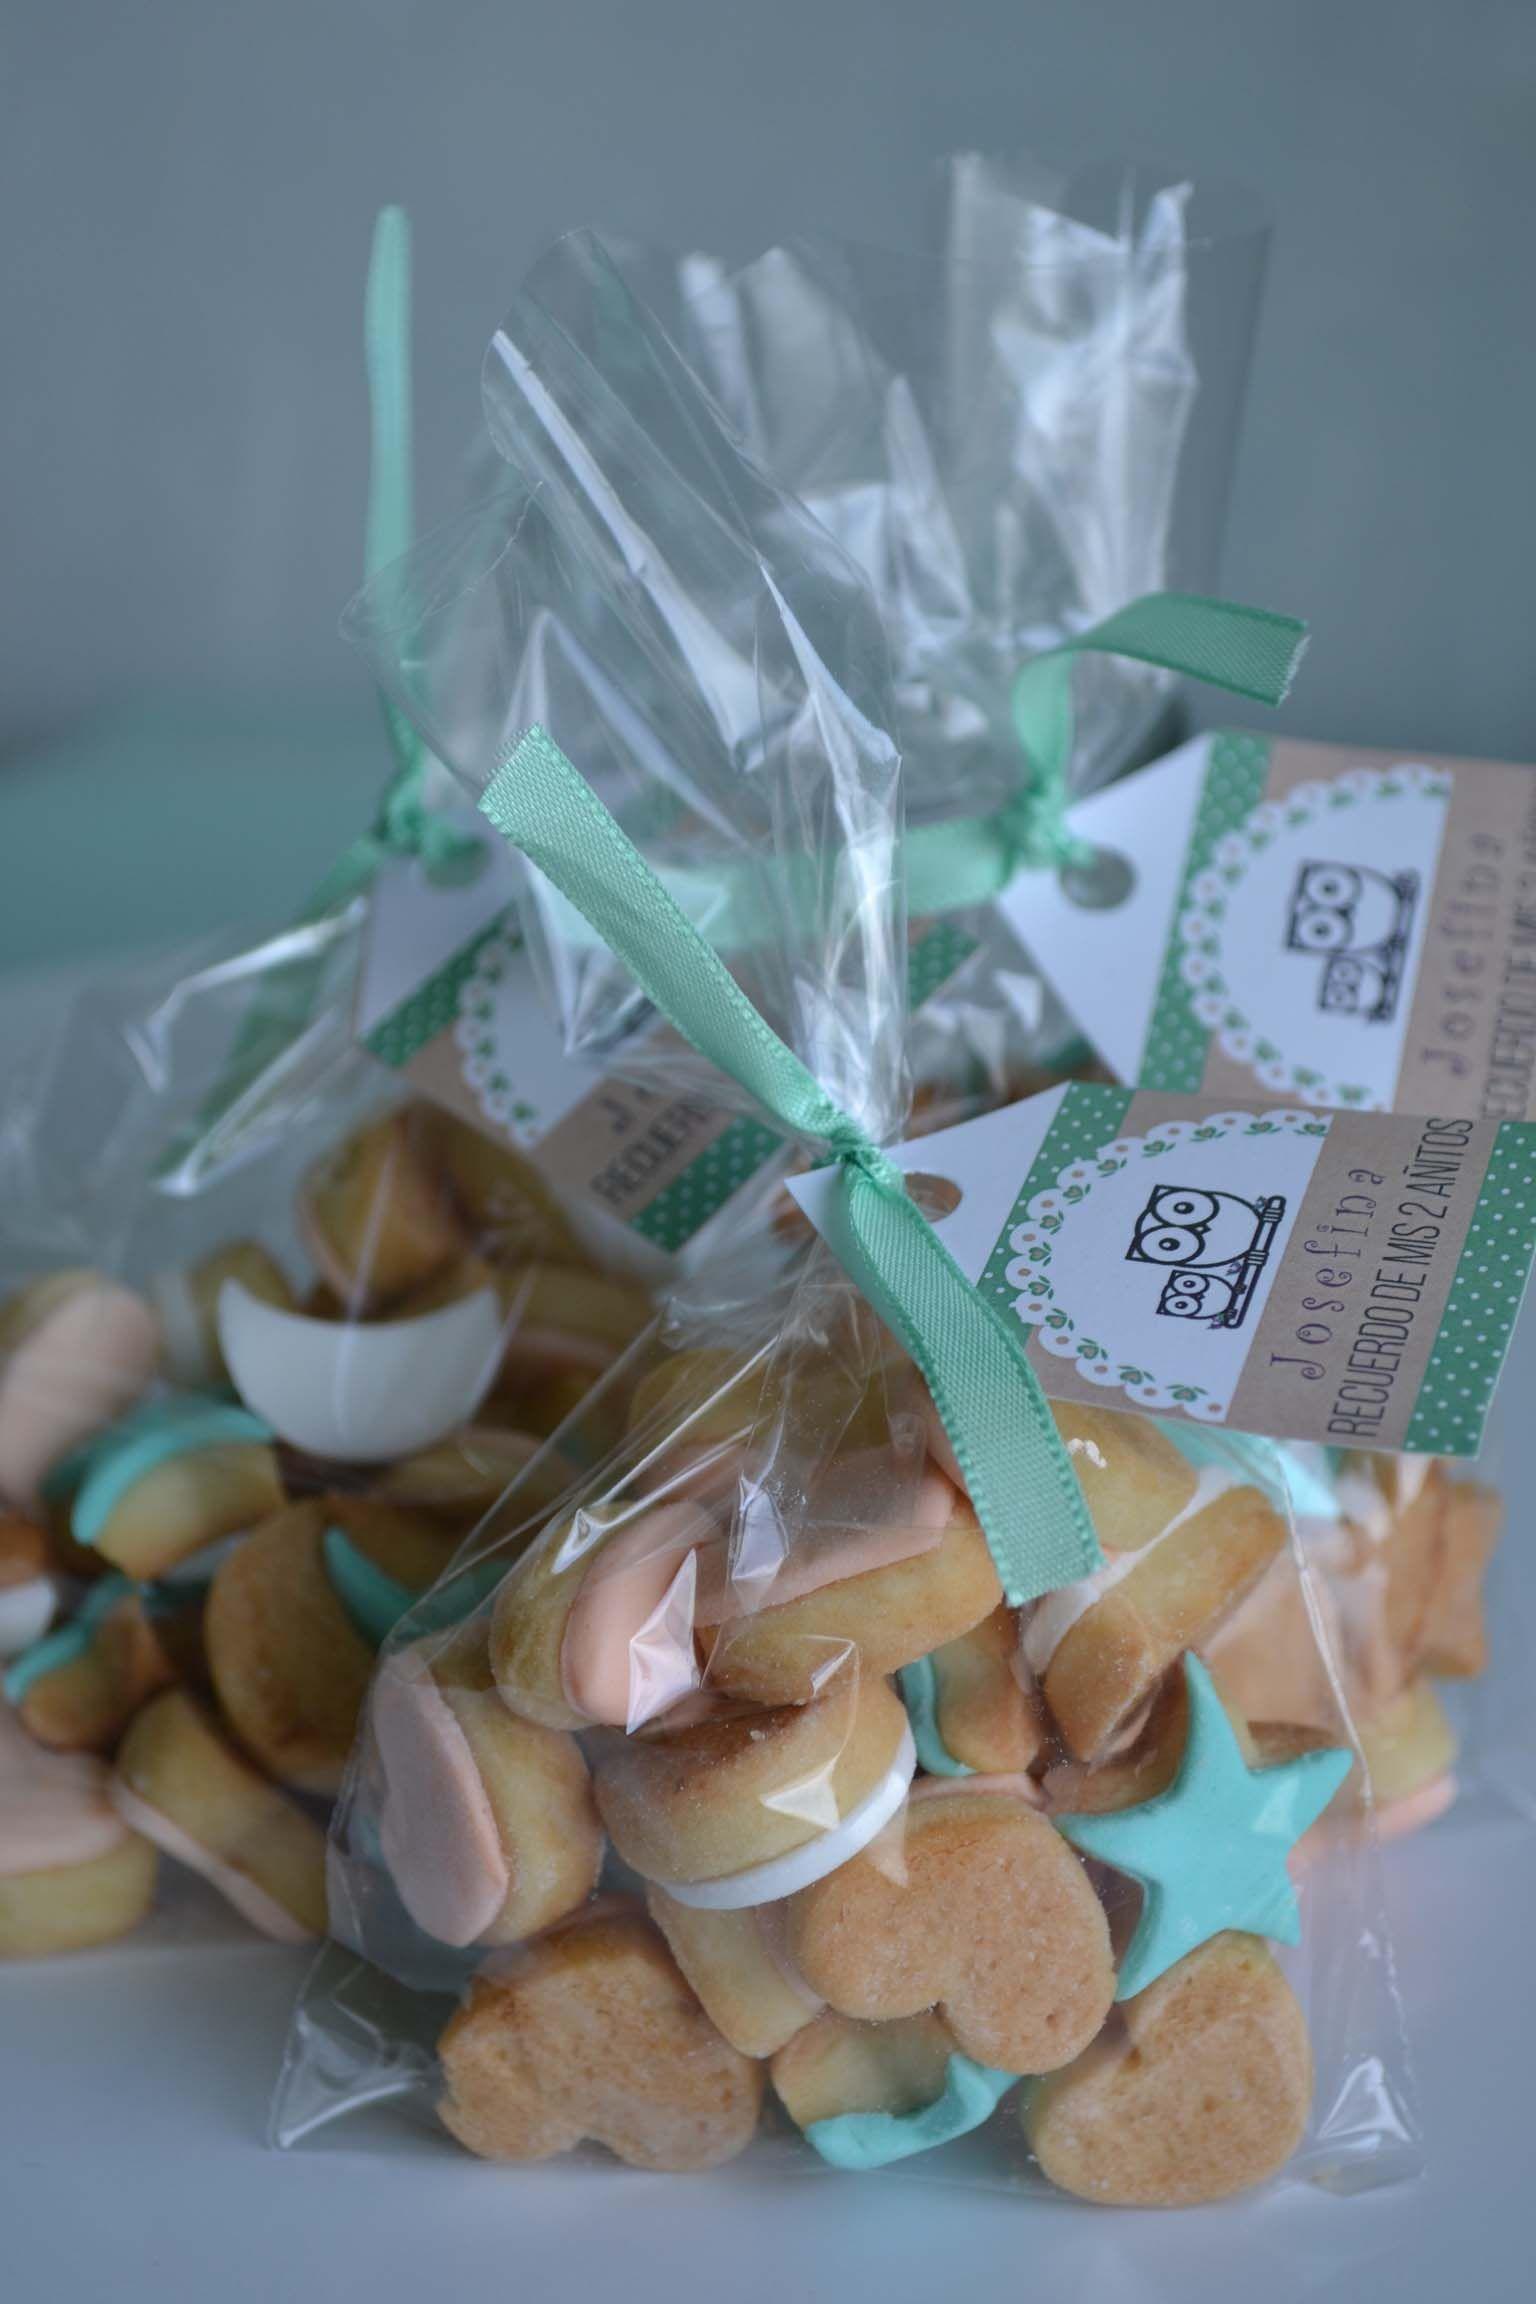 48101ff92 Souvenirs: bolsitas con mini galletiatas. #souvenirs #bolsitascumpleaños  #minigalletitas #souvenirscumpleaños